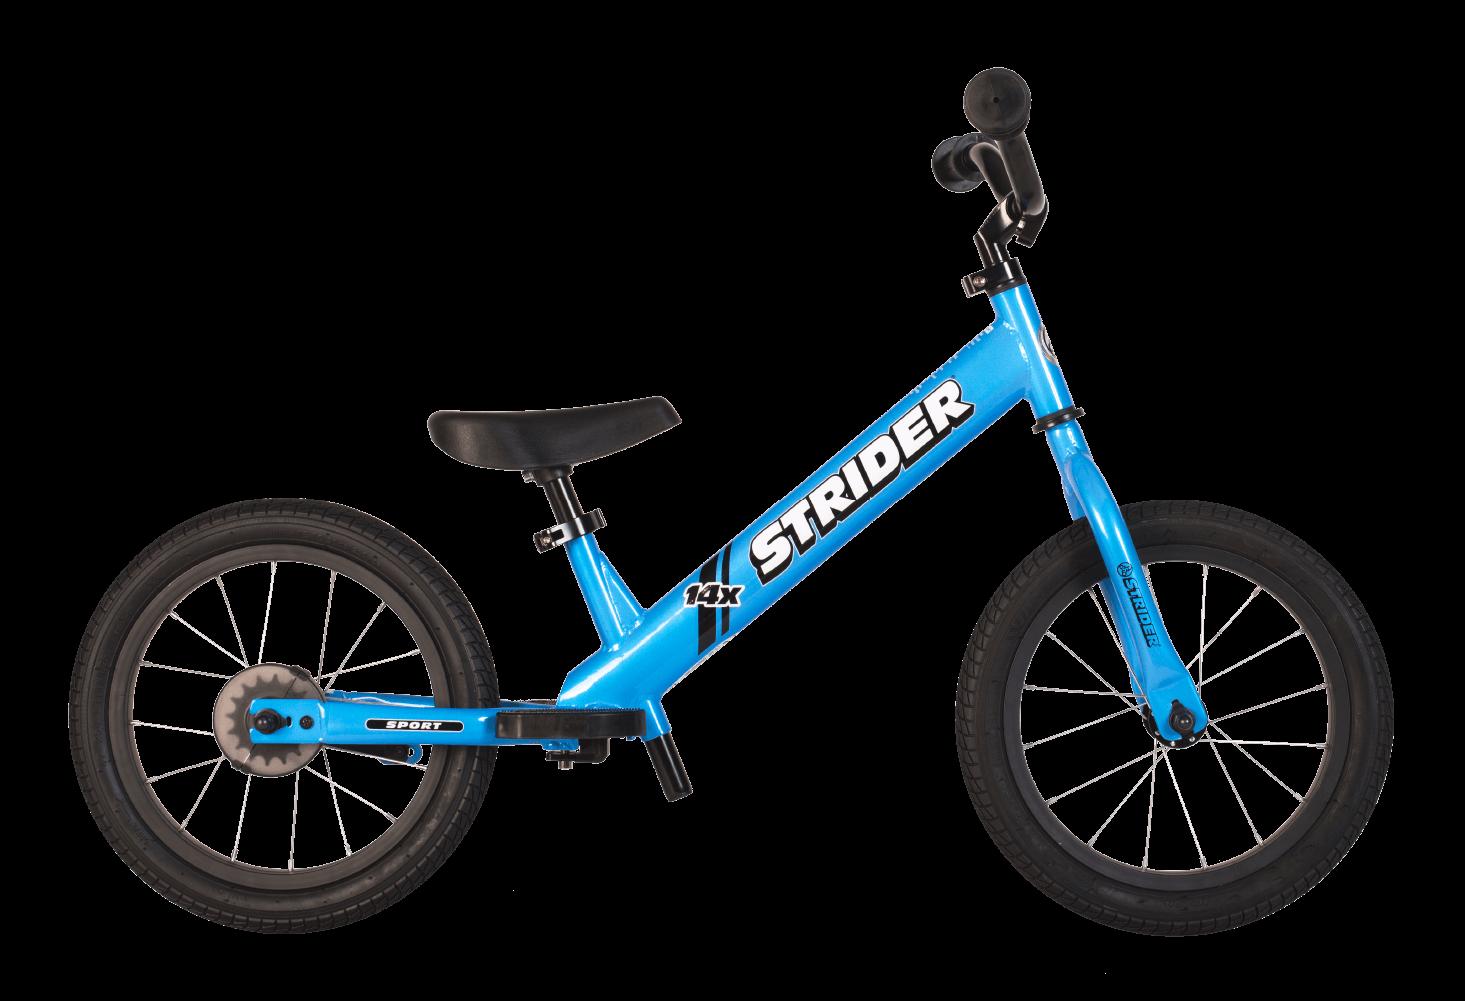 Strider 14x Balance Bike - Blue